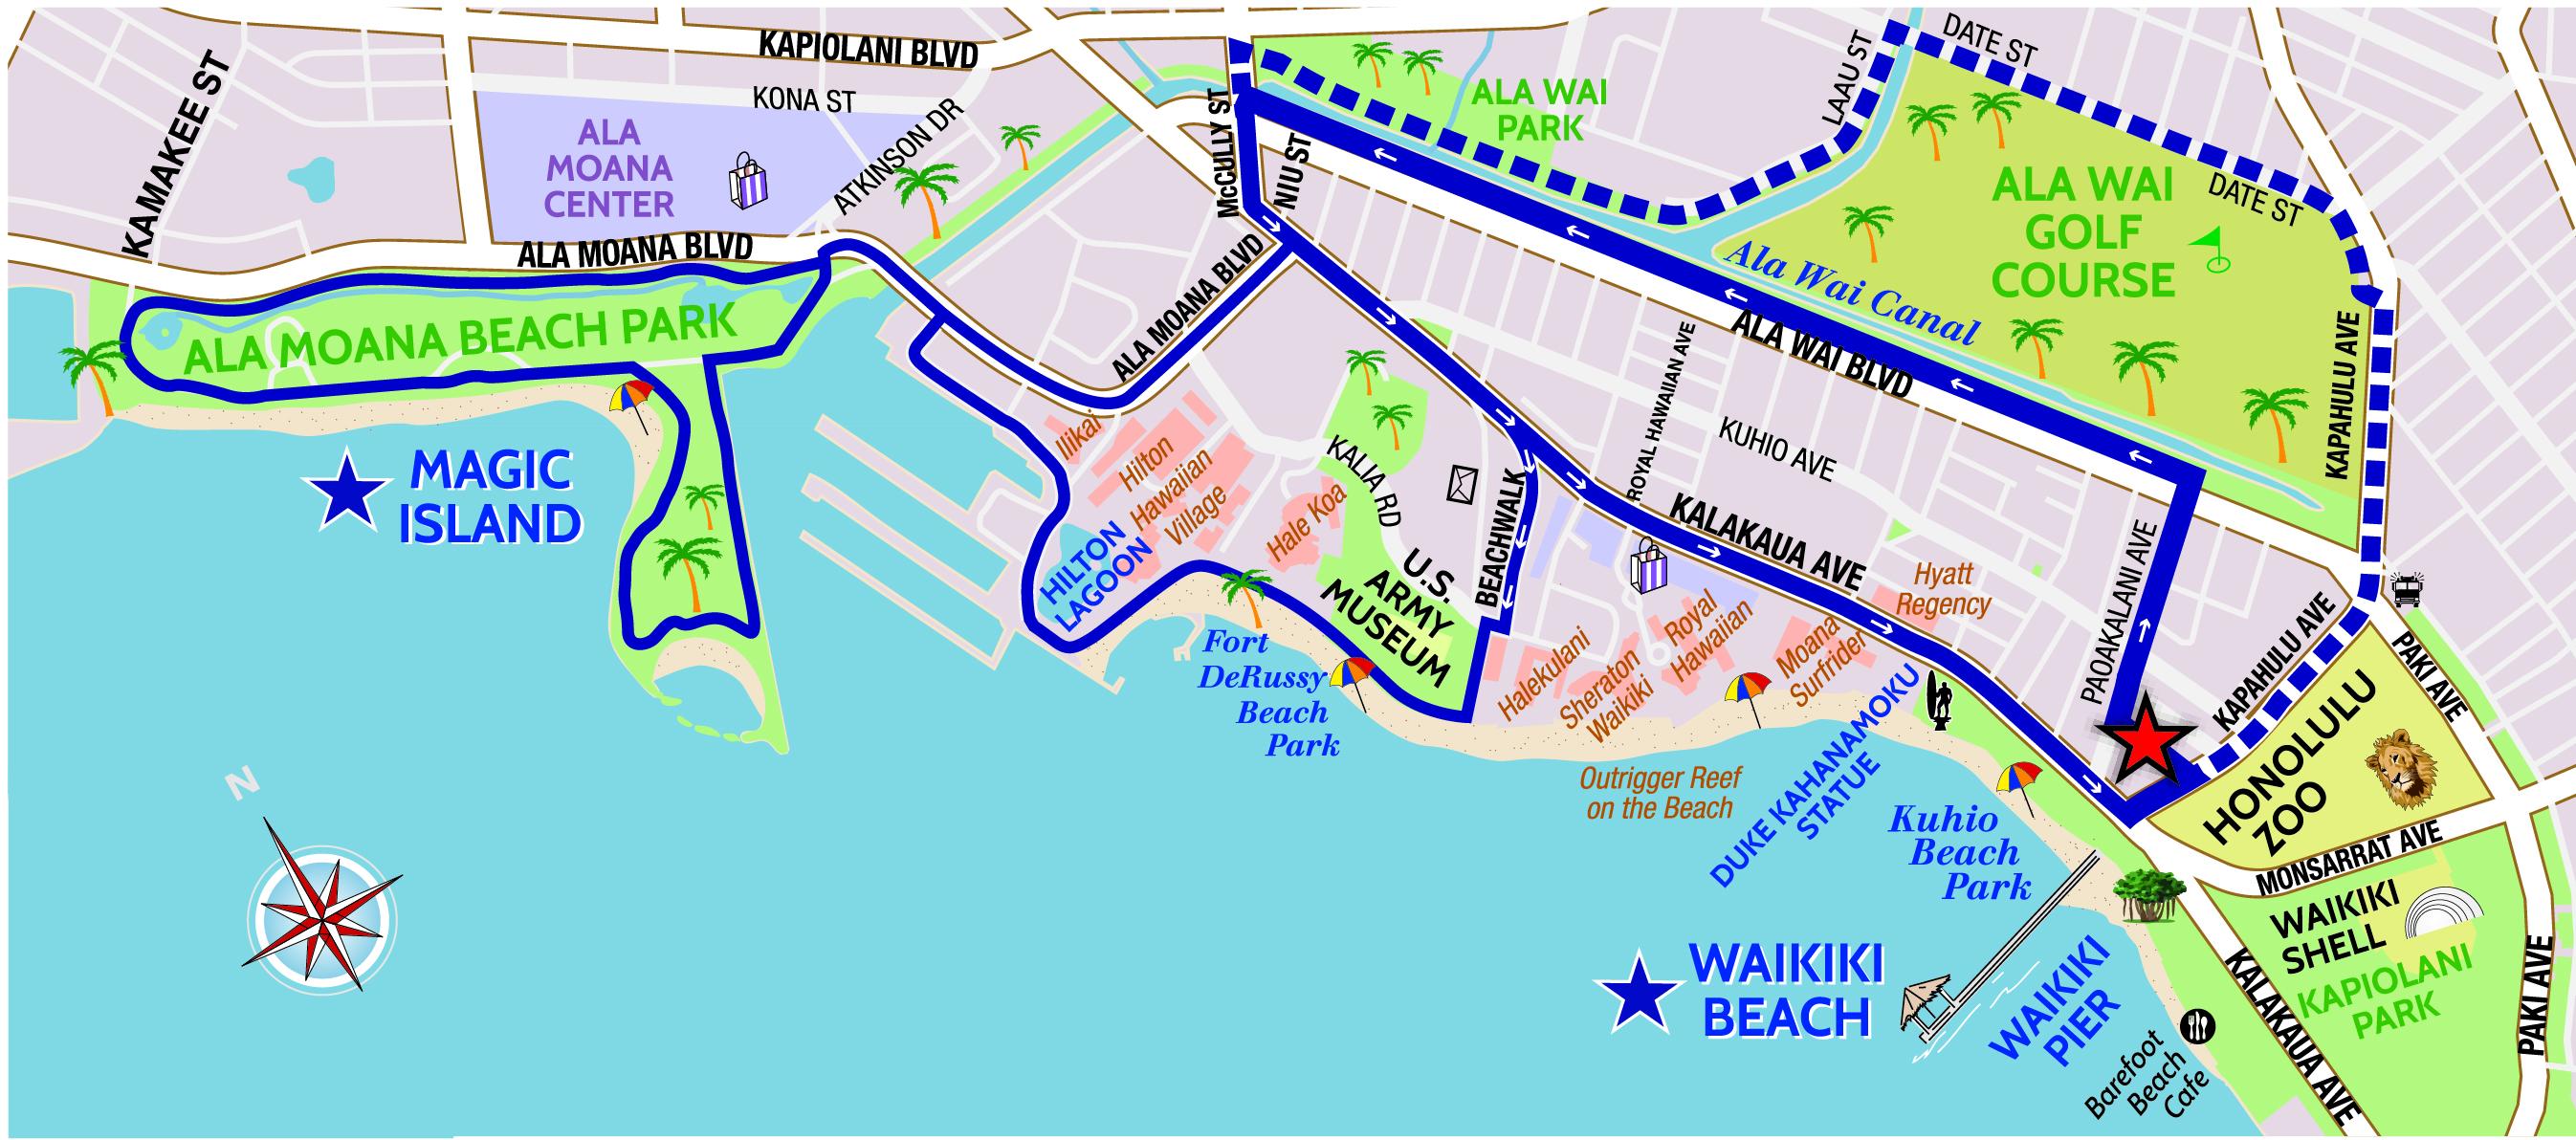 Waikiki Beach Hotels Map The Best Beaches In World